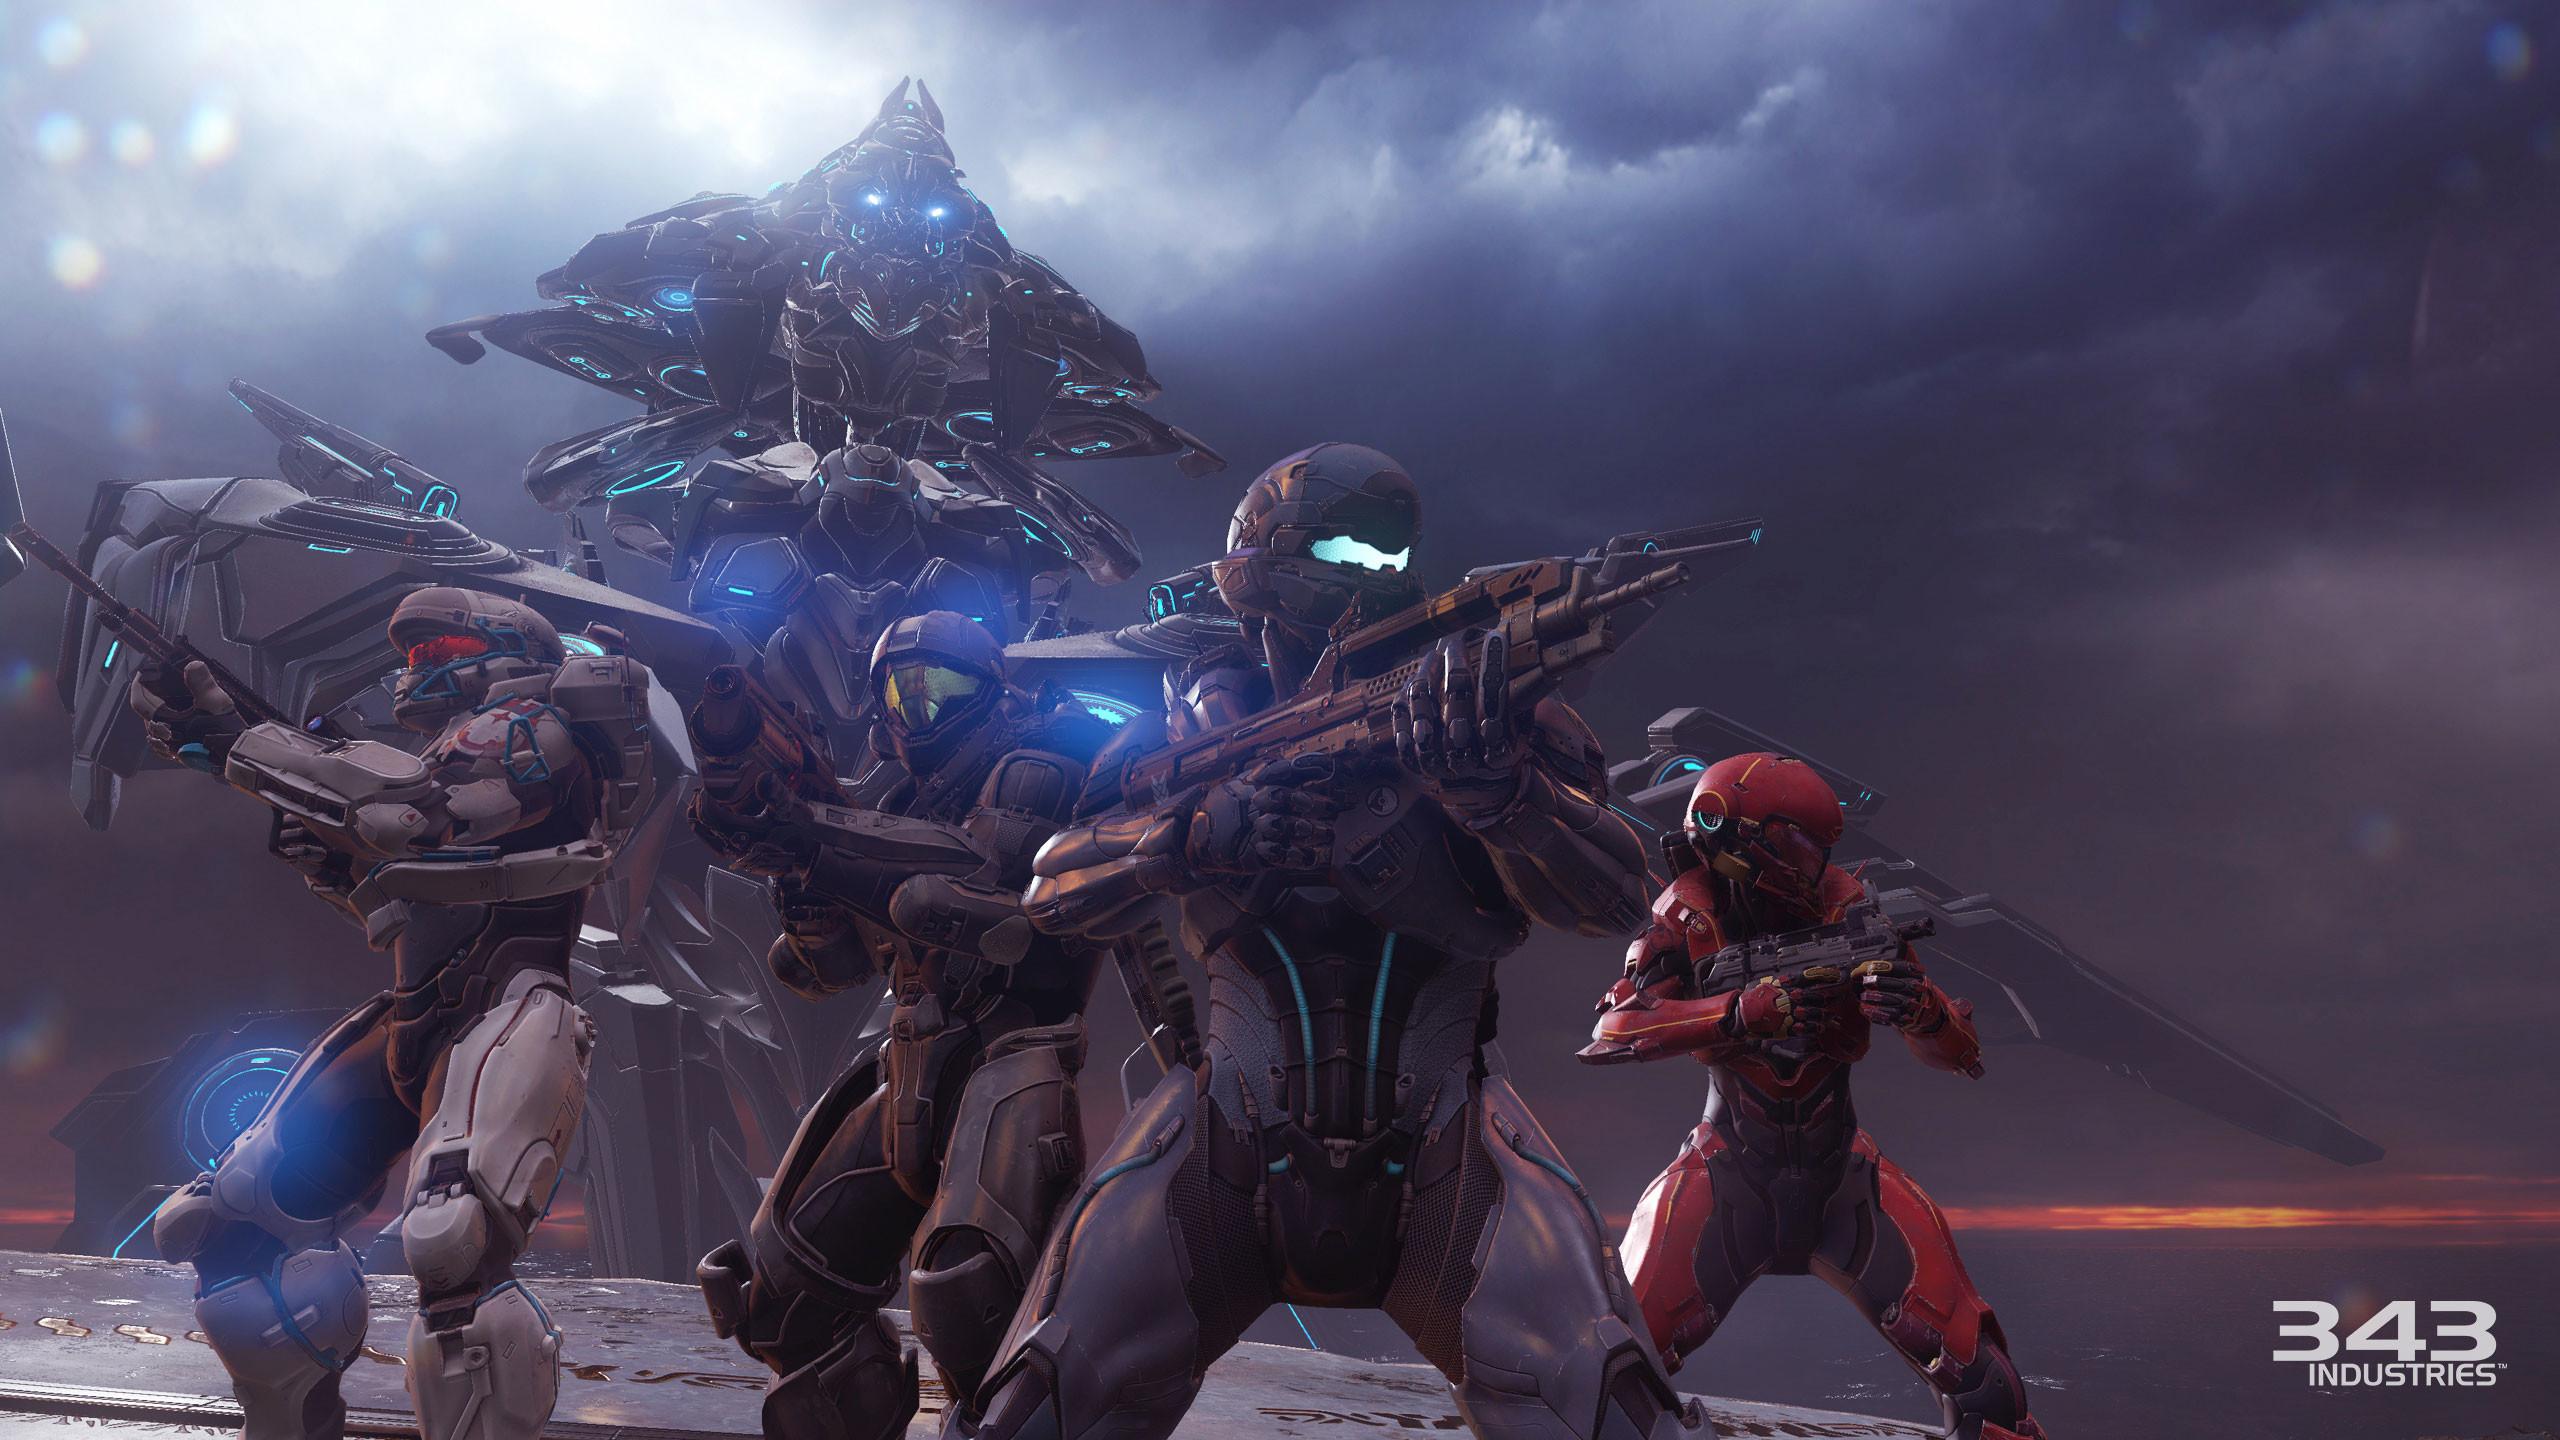 Halo 5 Blue Team Wallpaper (76+ images)